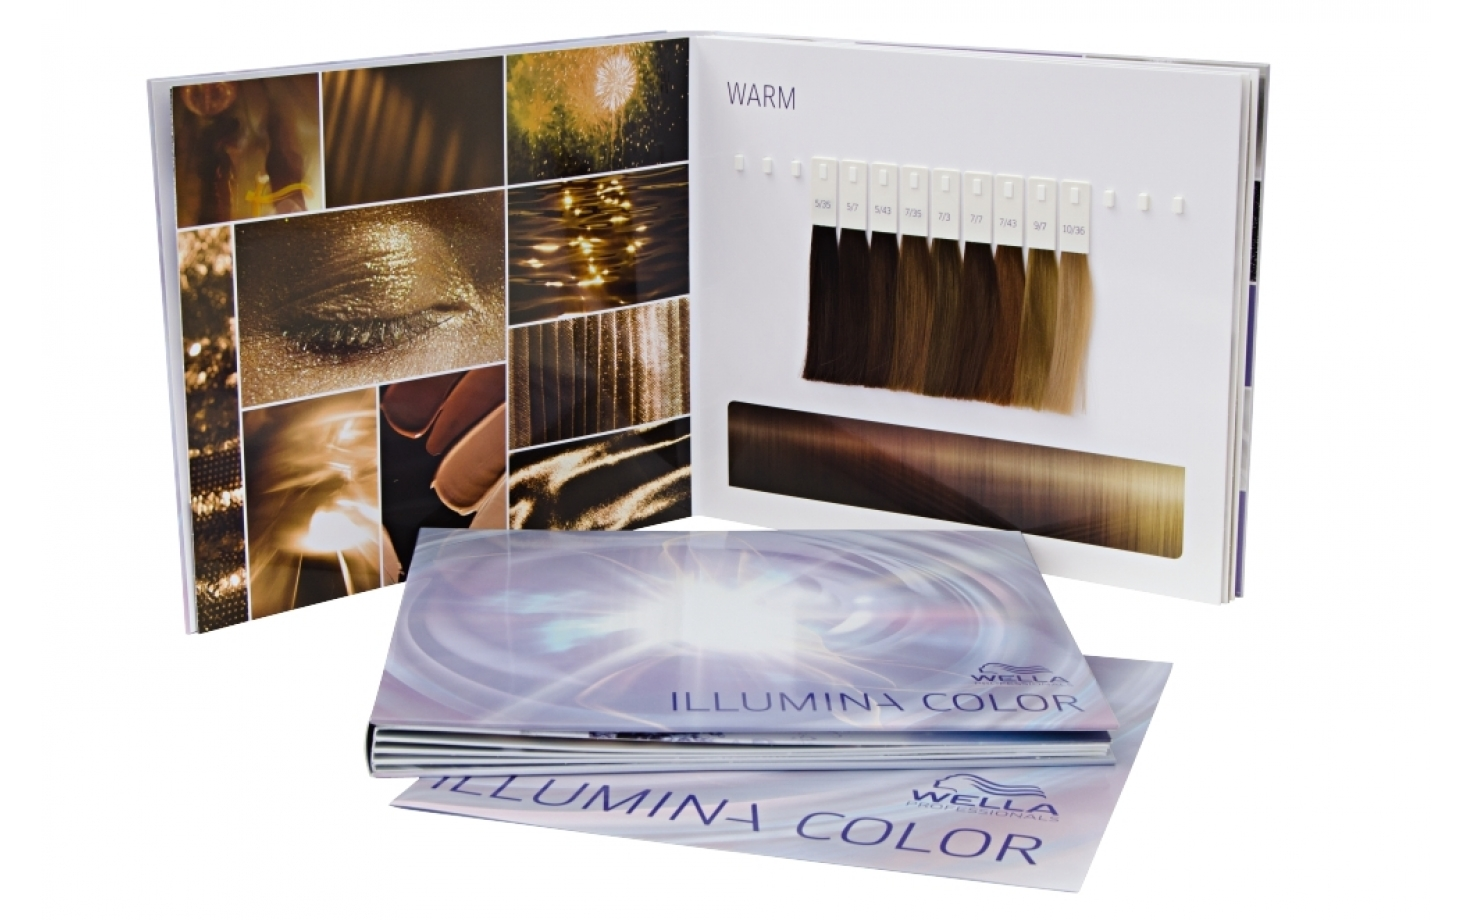 Illumina Color Farbkarte